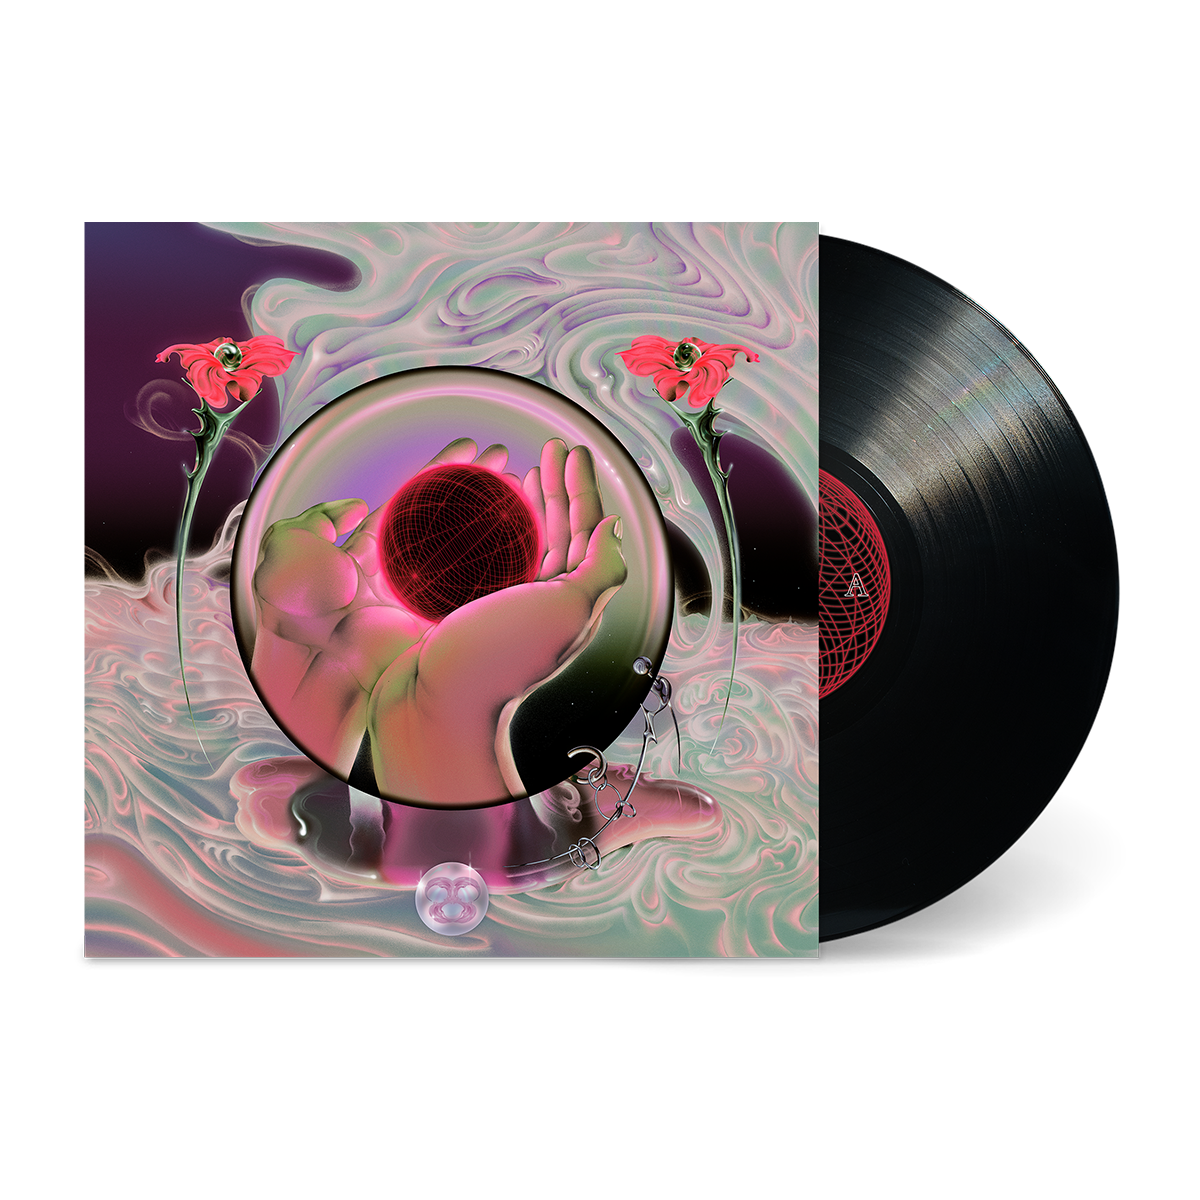 Mercurial World - Vinyl